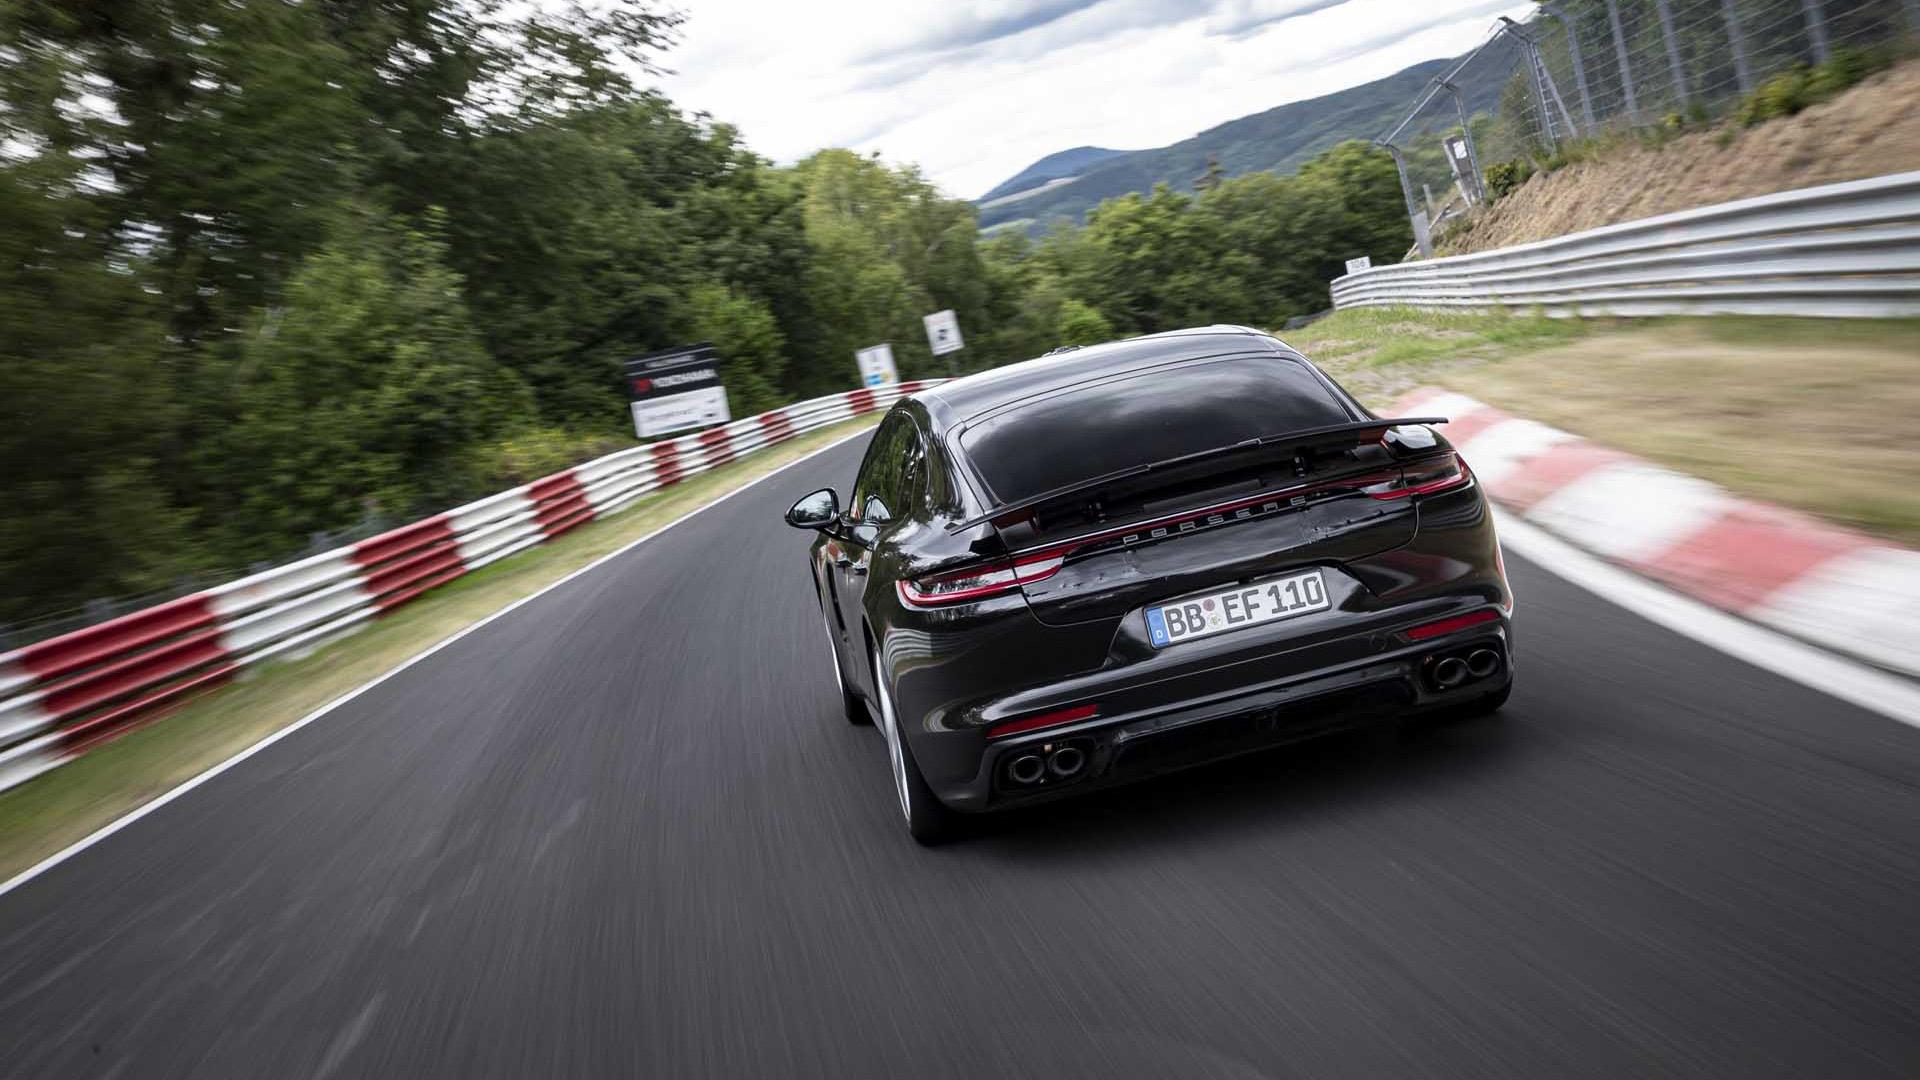 Porsche tester Lars Kern took the 2021 Panamera around the Nürburgring in 7:29.81 - August 2020